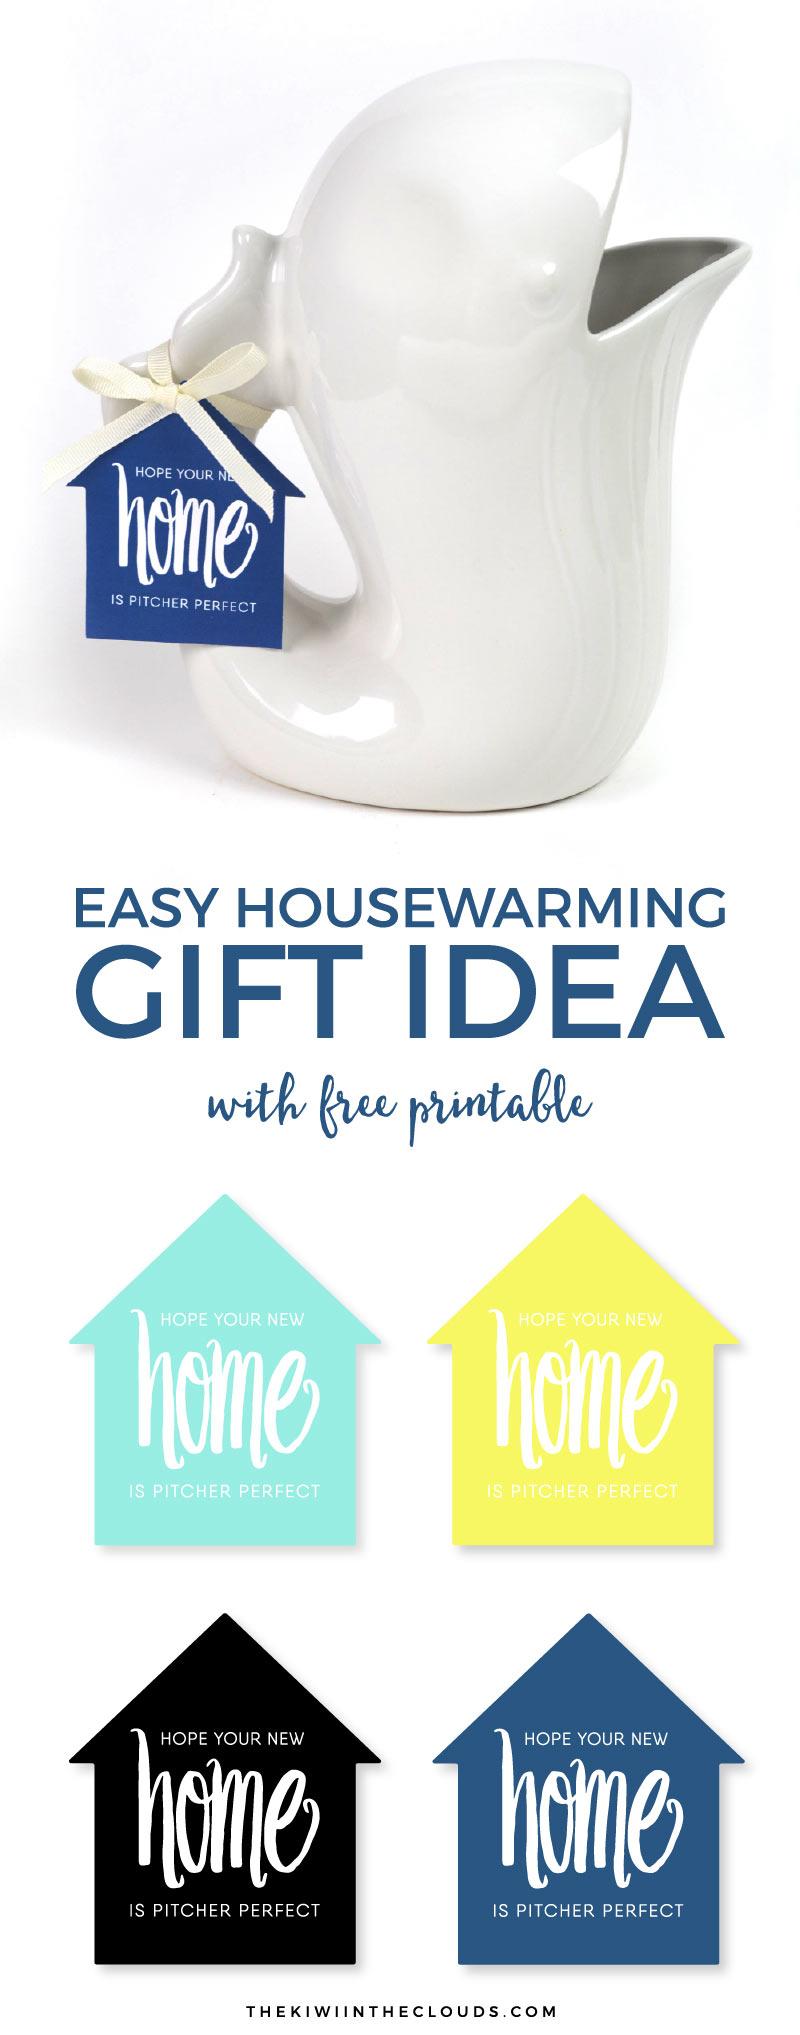 DIY Housewarming Gift Idea | New Home Gift | Gift Ideas | Free Printables